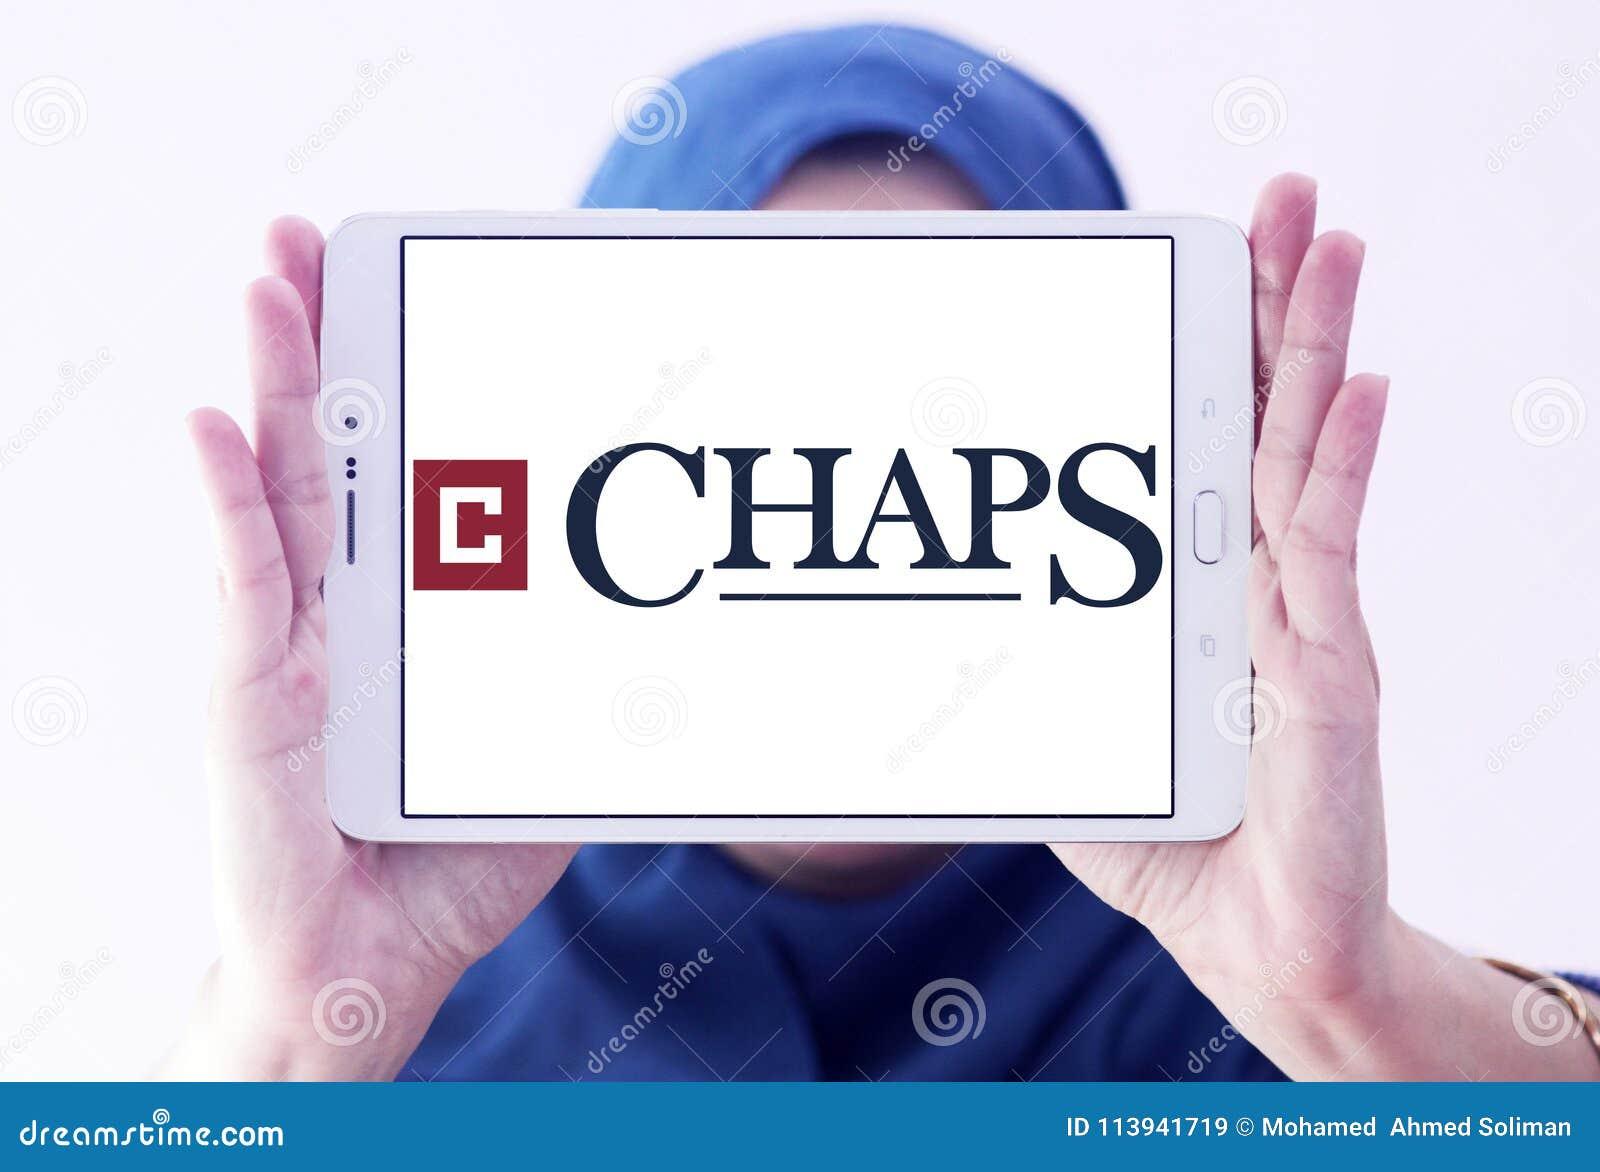 Chaps Clothing Brand Logo Editorial Stock Image Image Of Symbols